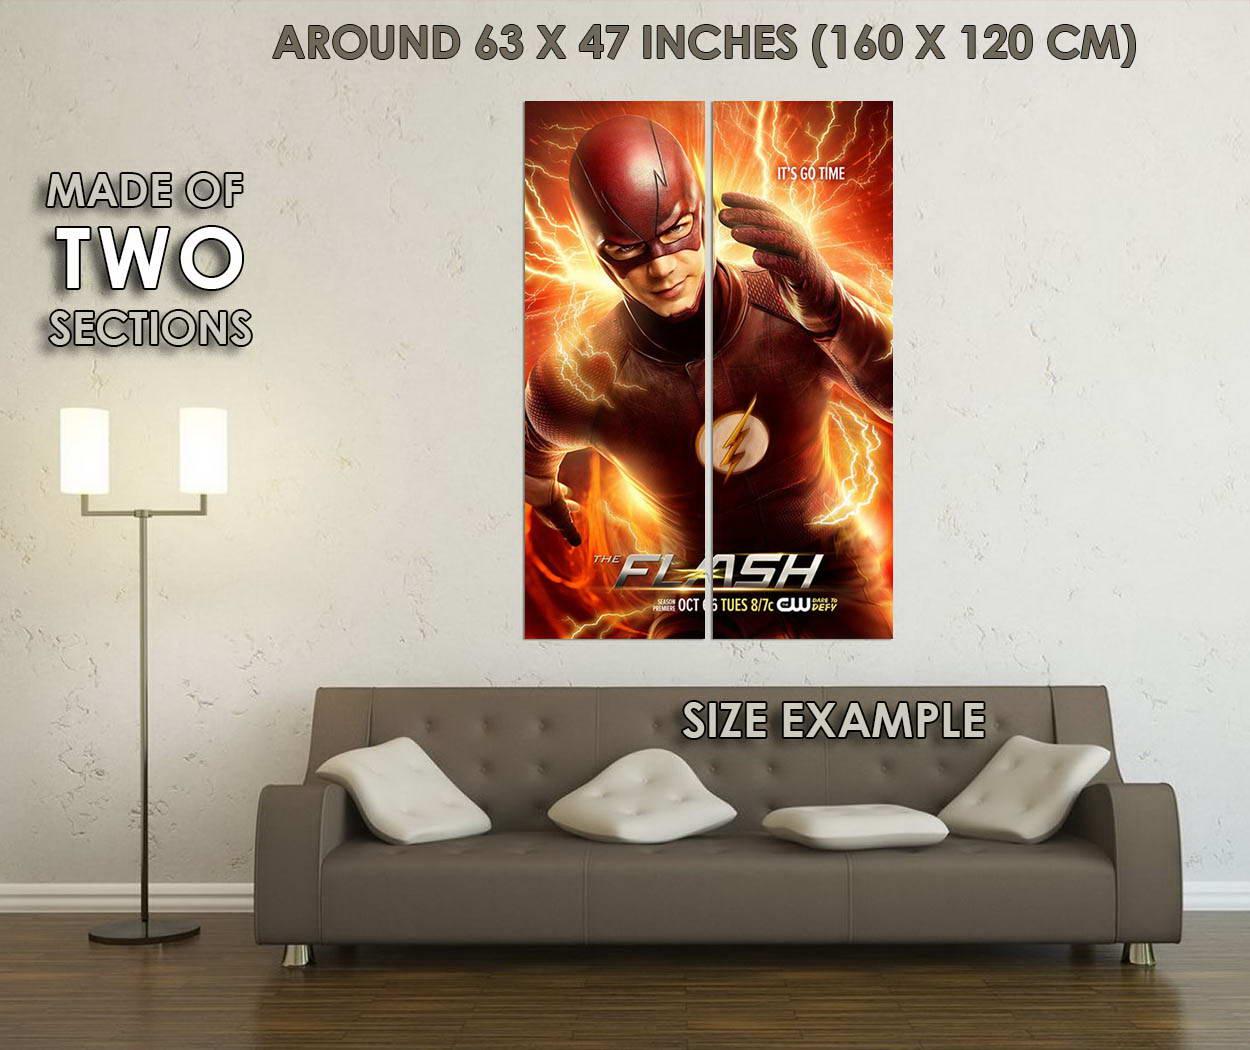 10114-The-Flash-Season-2-TV-Series-Art-LAMINATED-POSTER-CA thumbnail 6